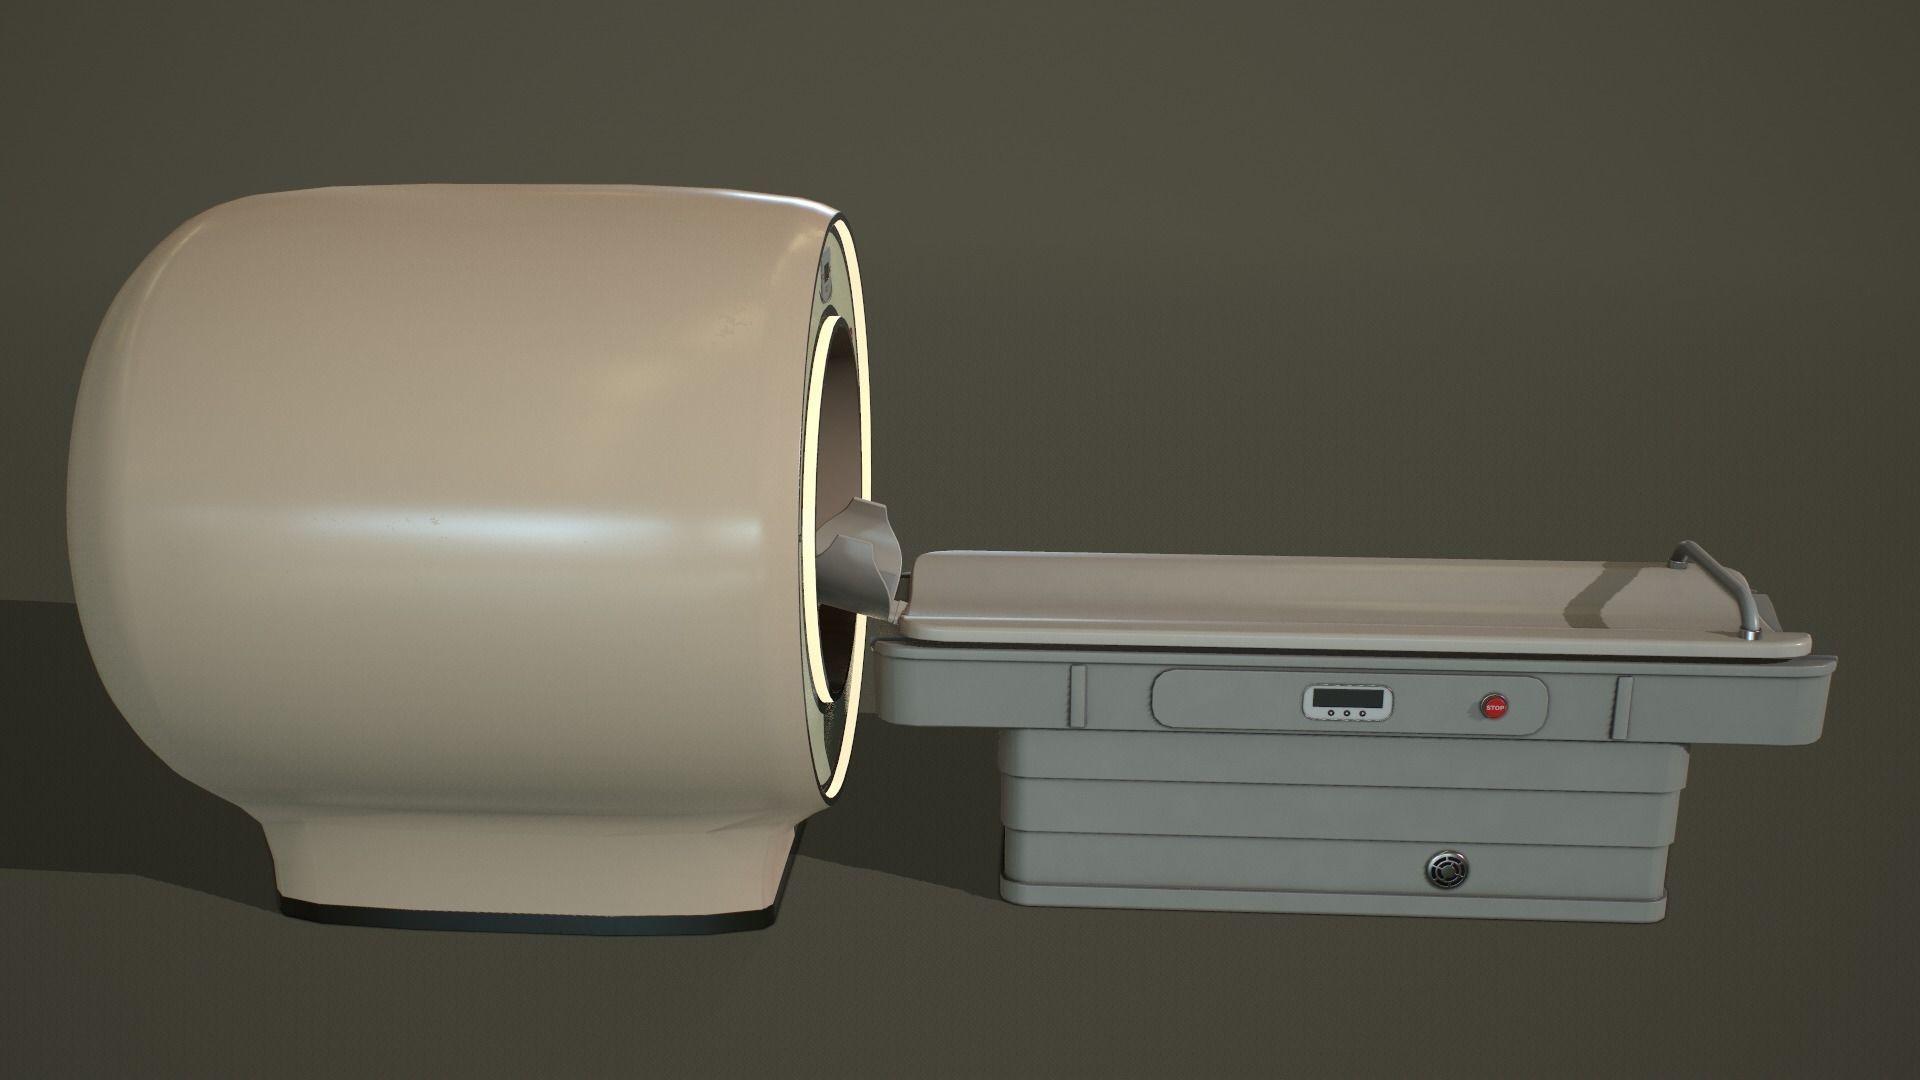 Magnetic resonance imaging PBR